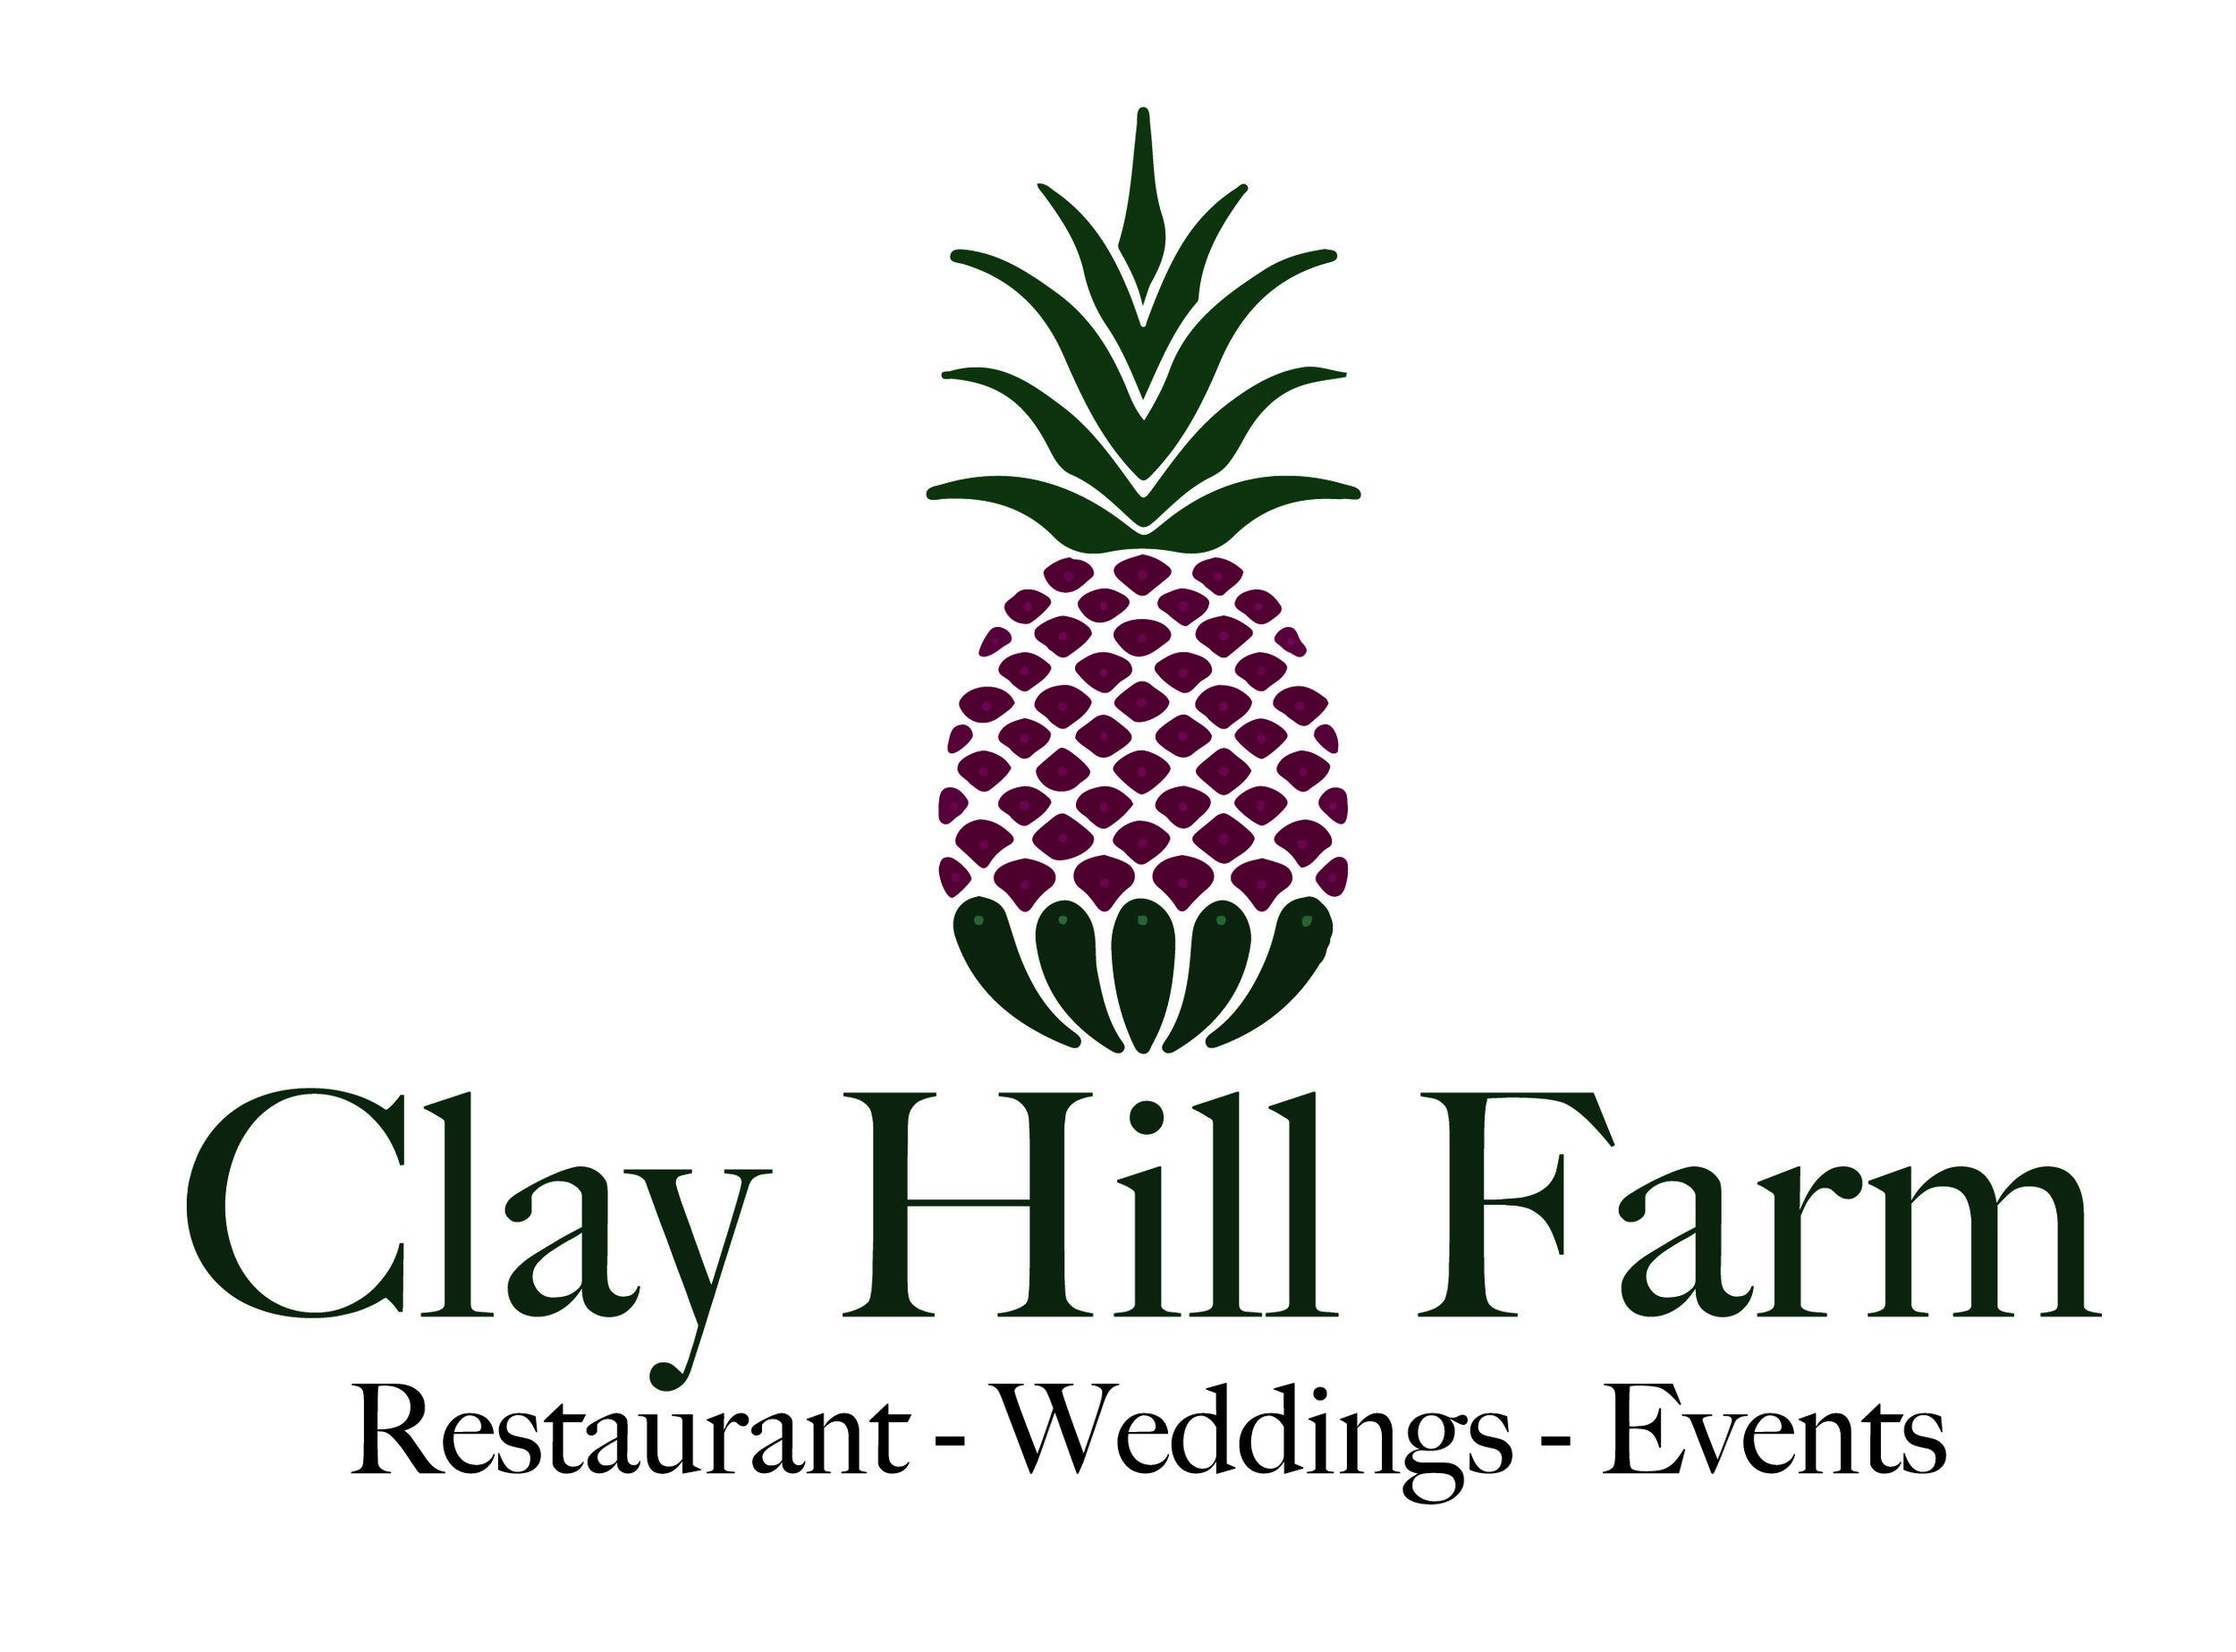 2018_Clay-Hill-Farm_logo.jpg